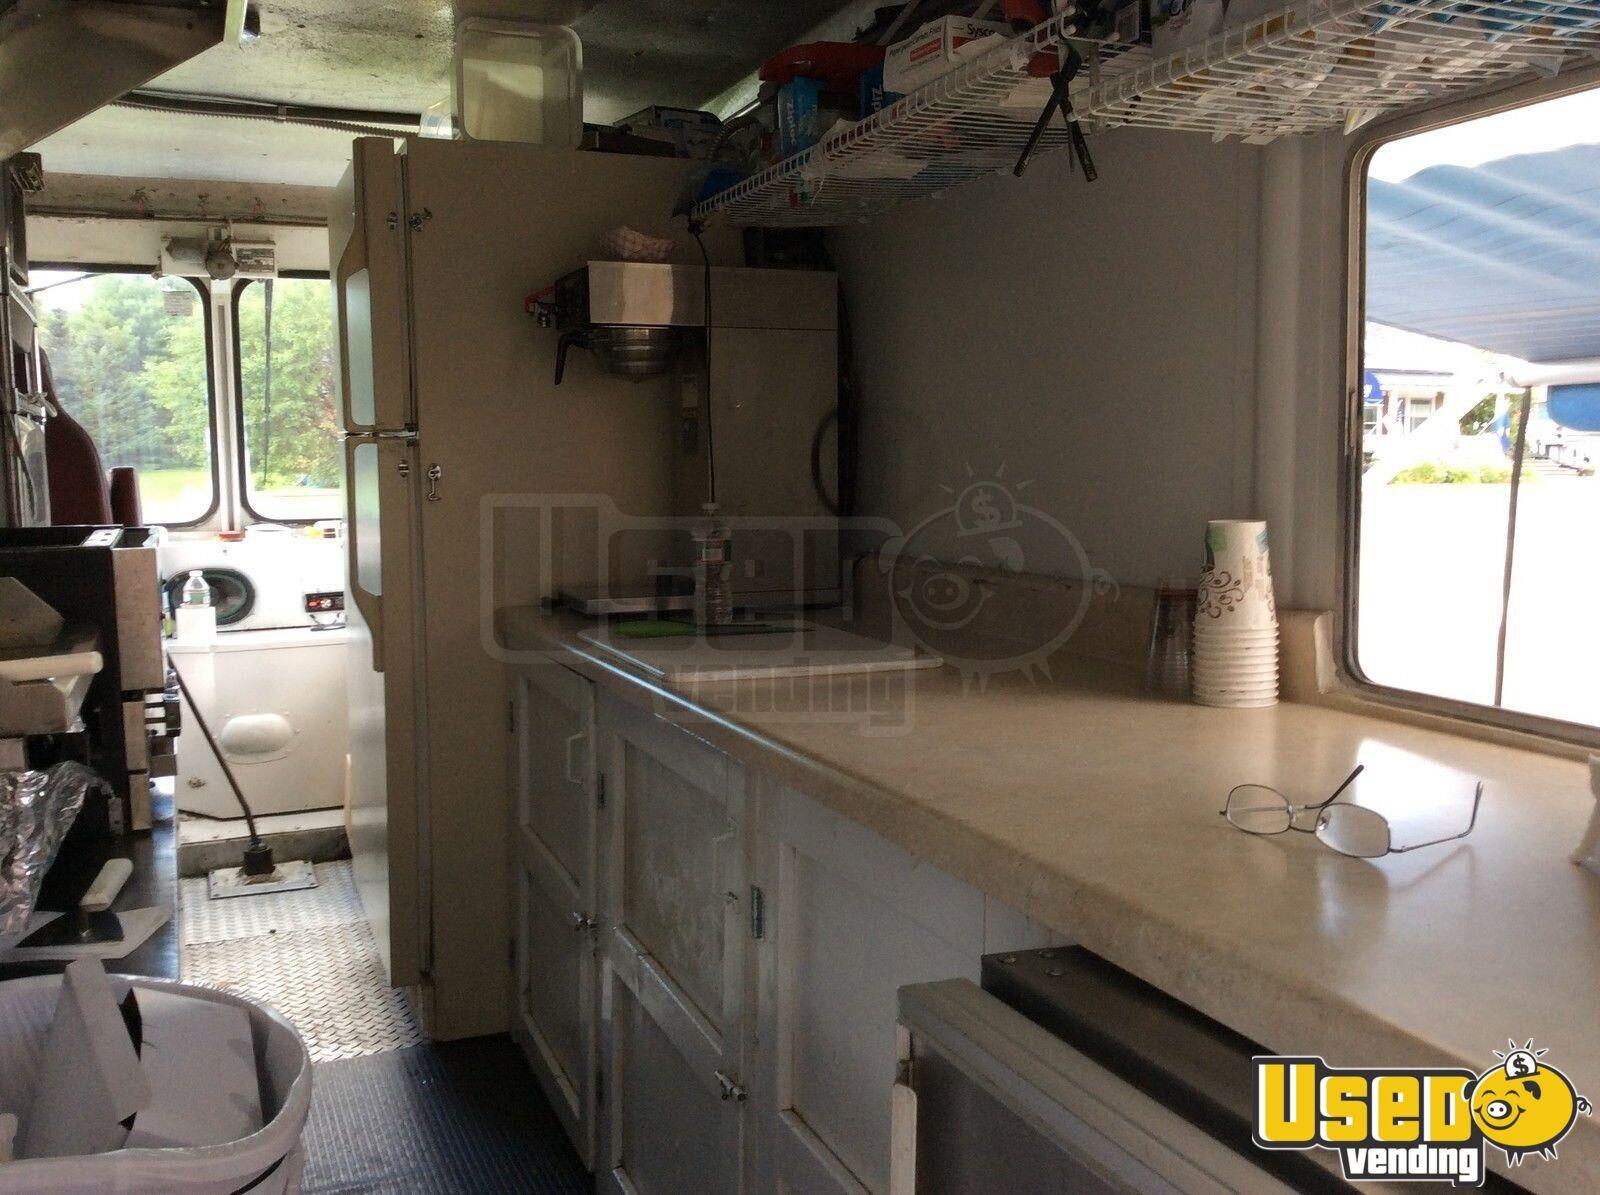 Used Kitchen Cabinets Craigslist Inland Empire